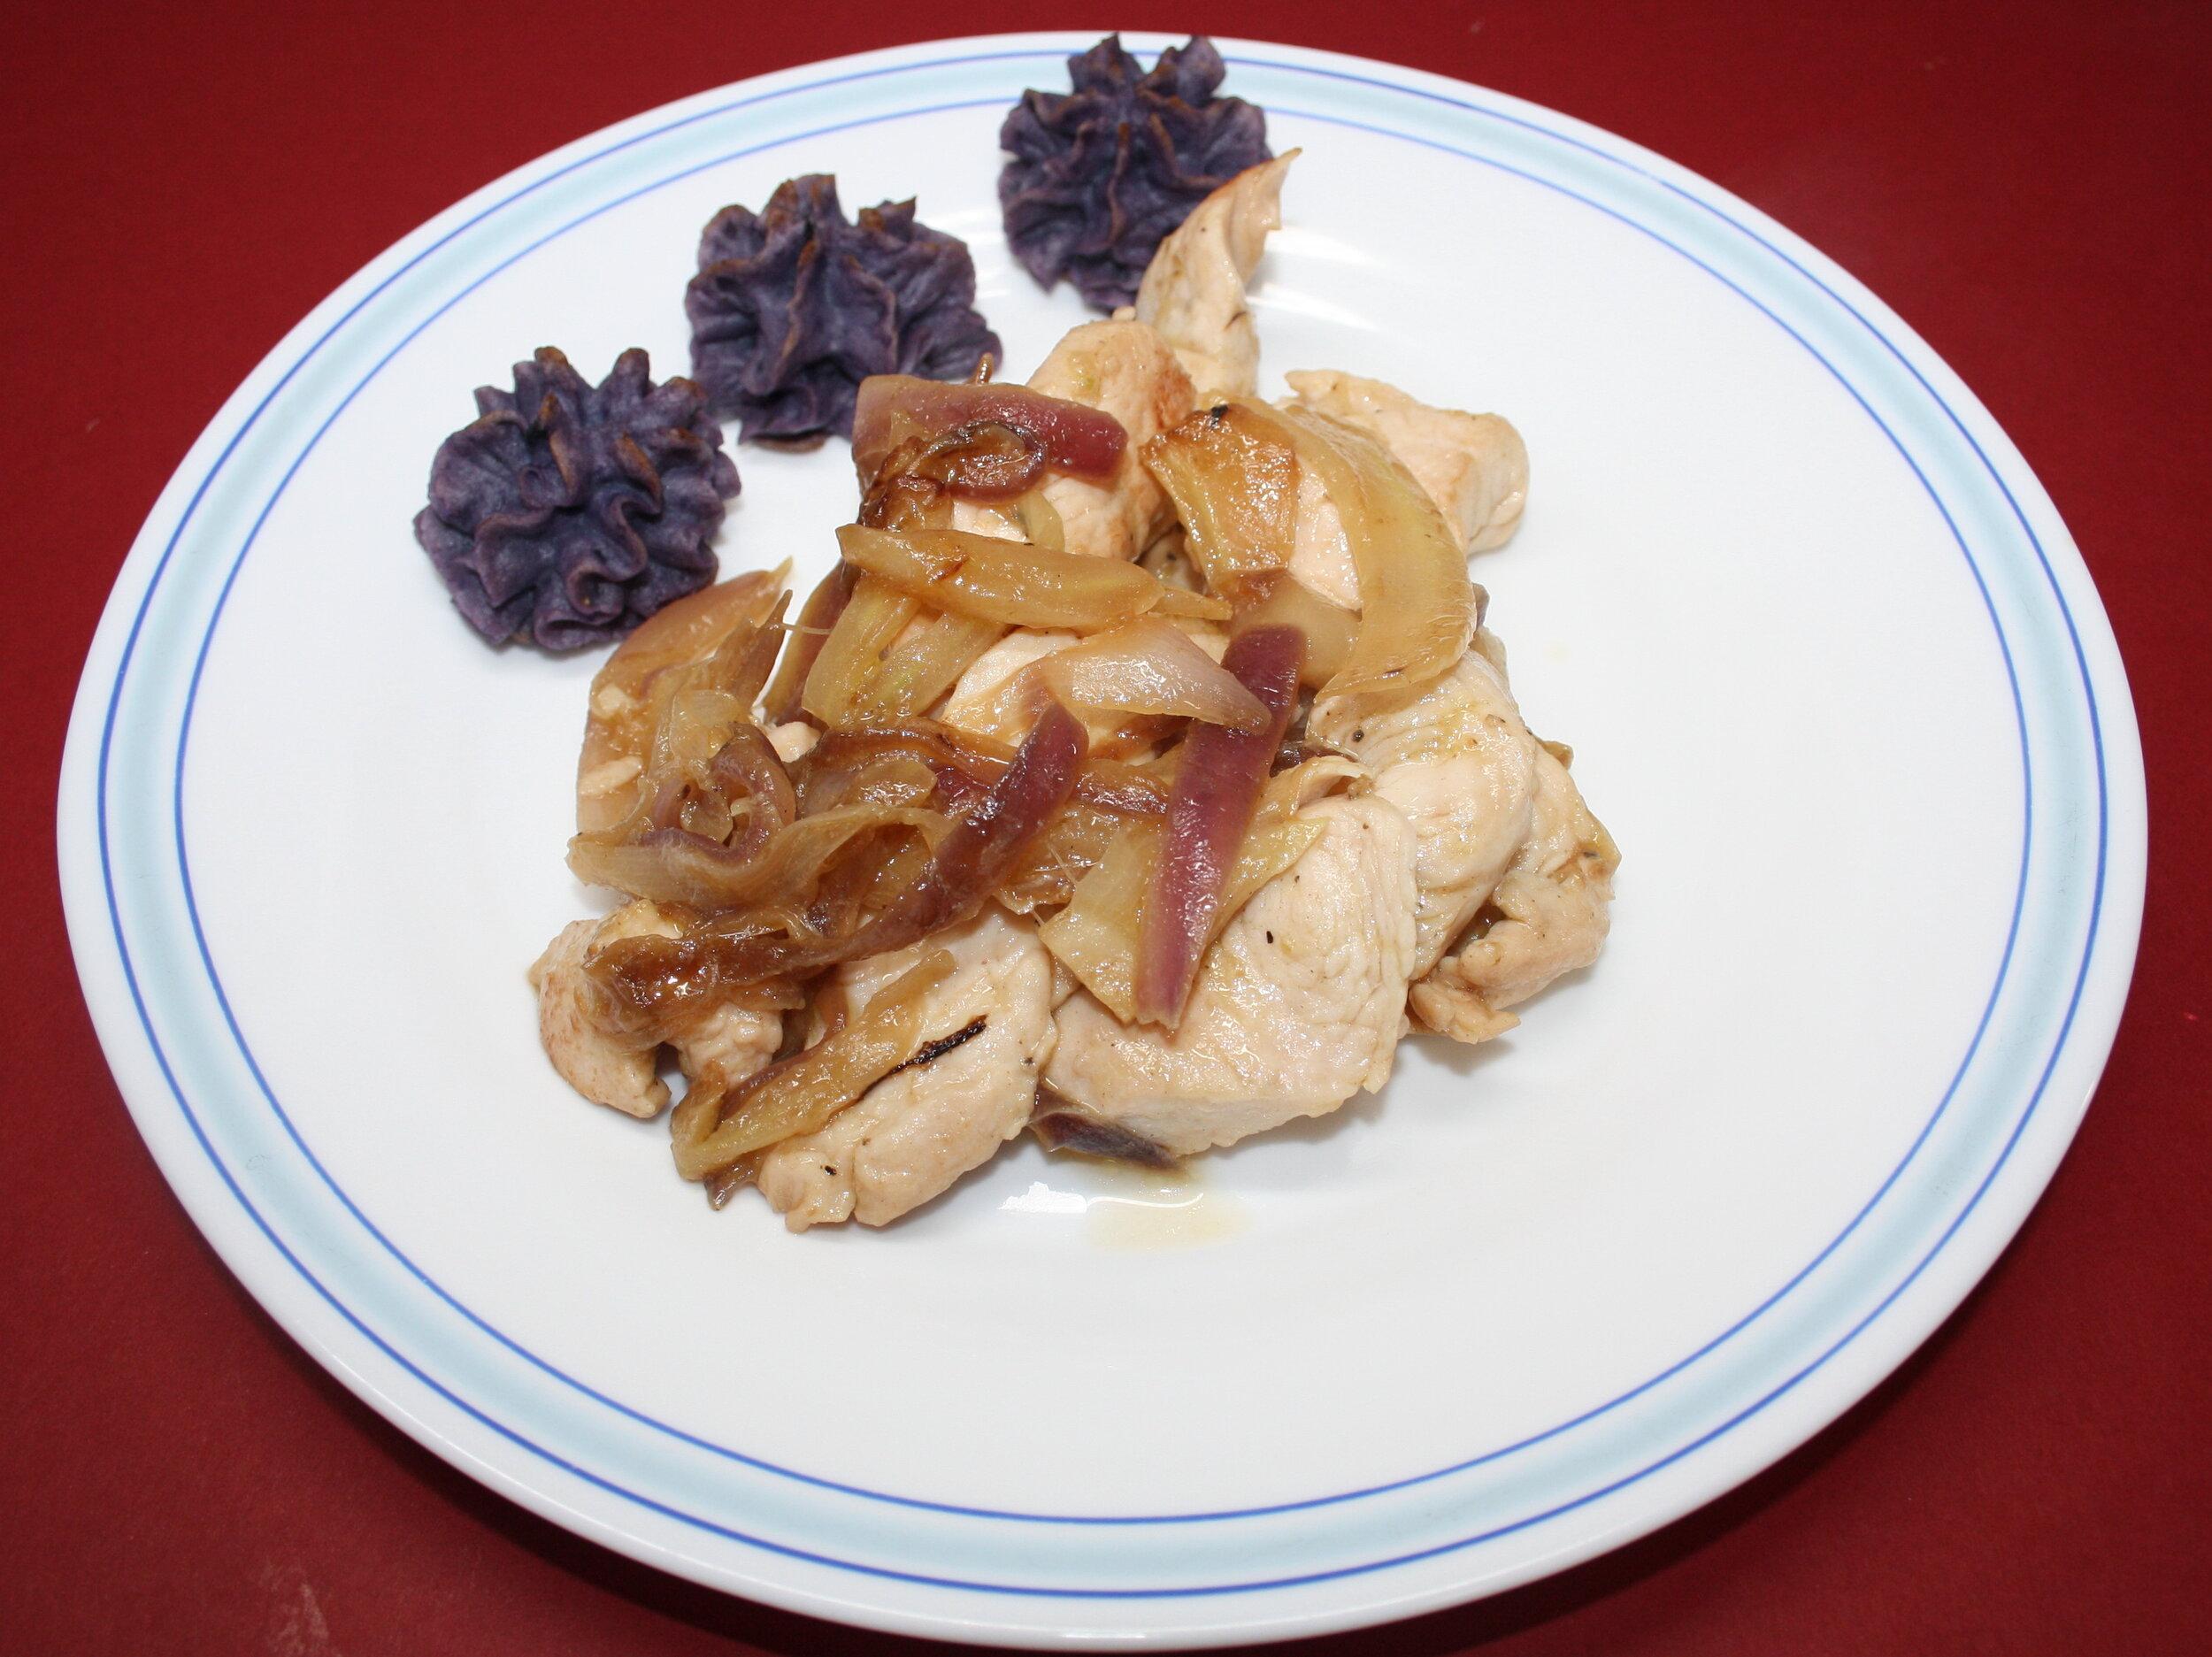 Acompañando un plato de pollo con cebolla